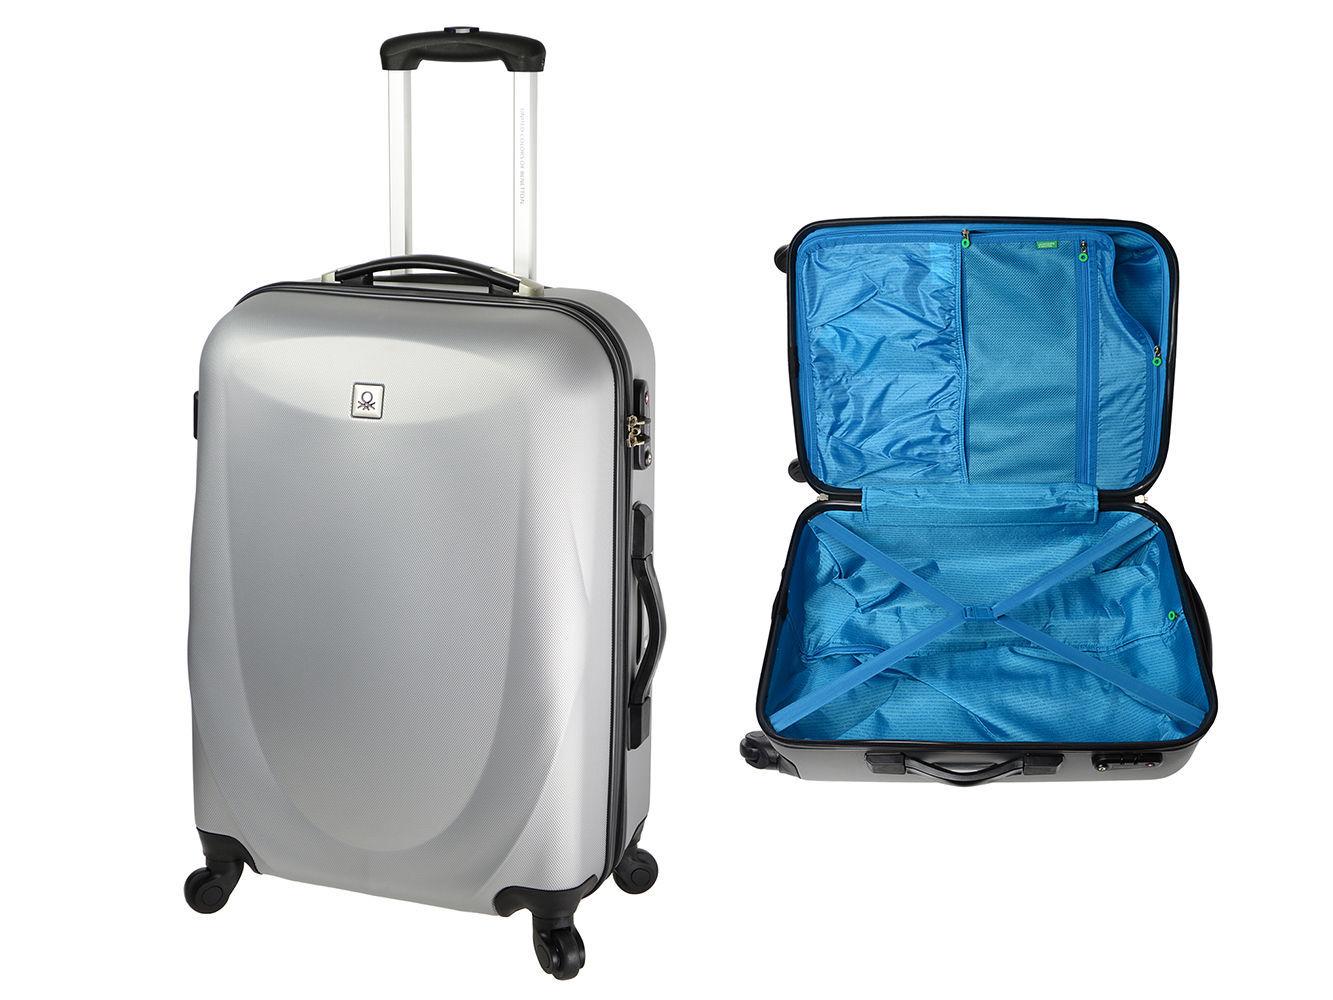 43b0c9a0a6b5a BENETTON Weight It średnia walizka twarda /24h - 6951273537 ...